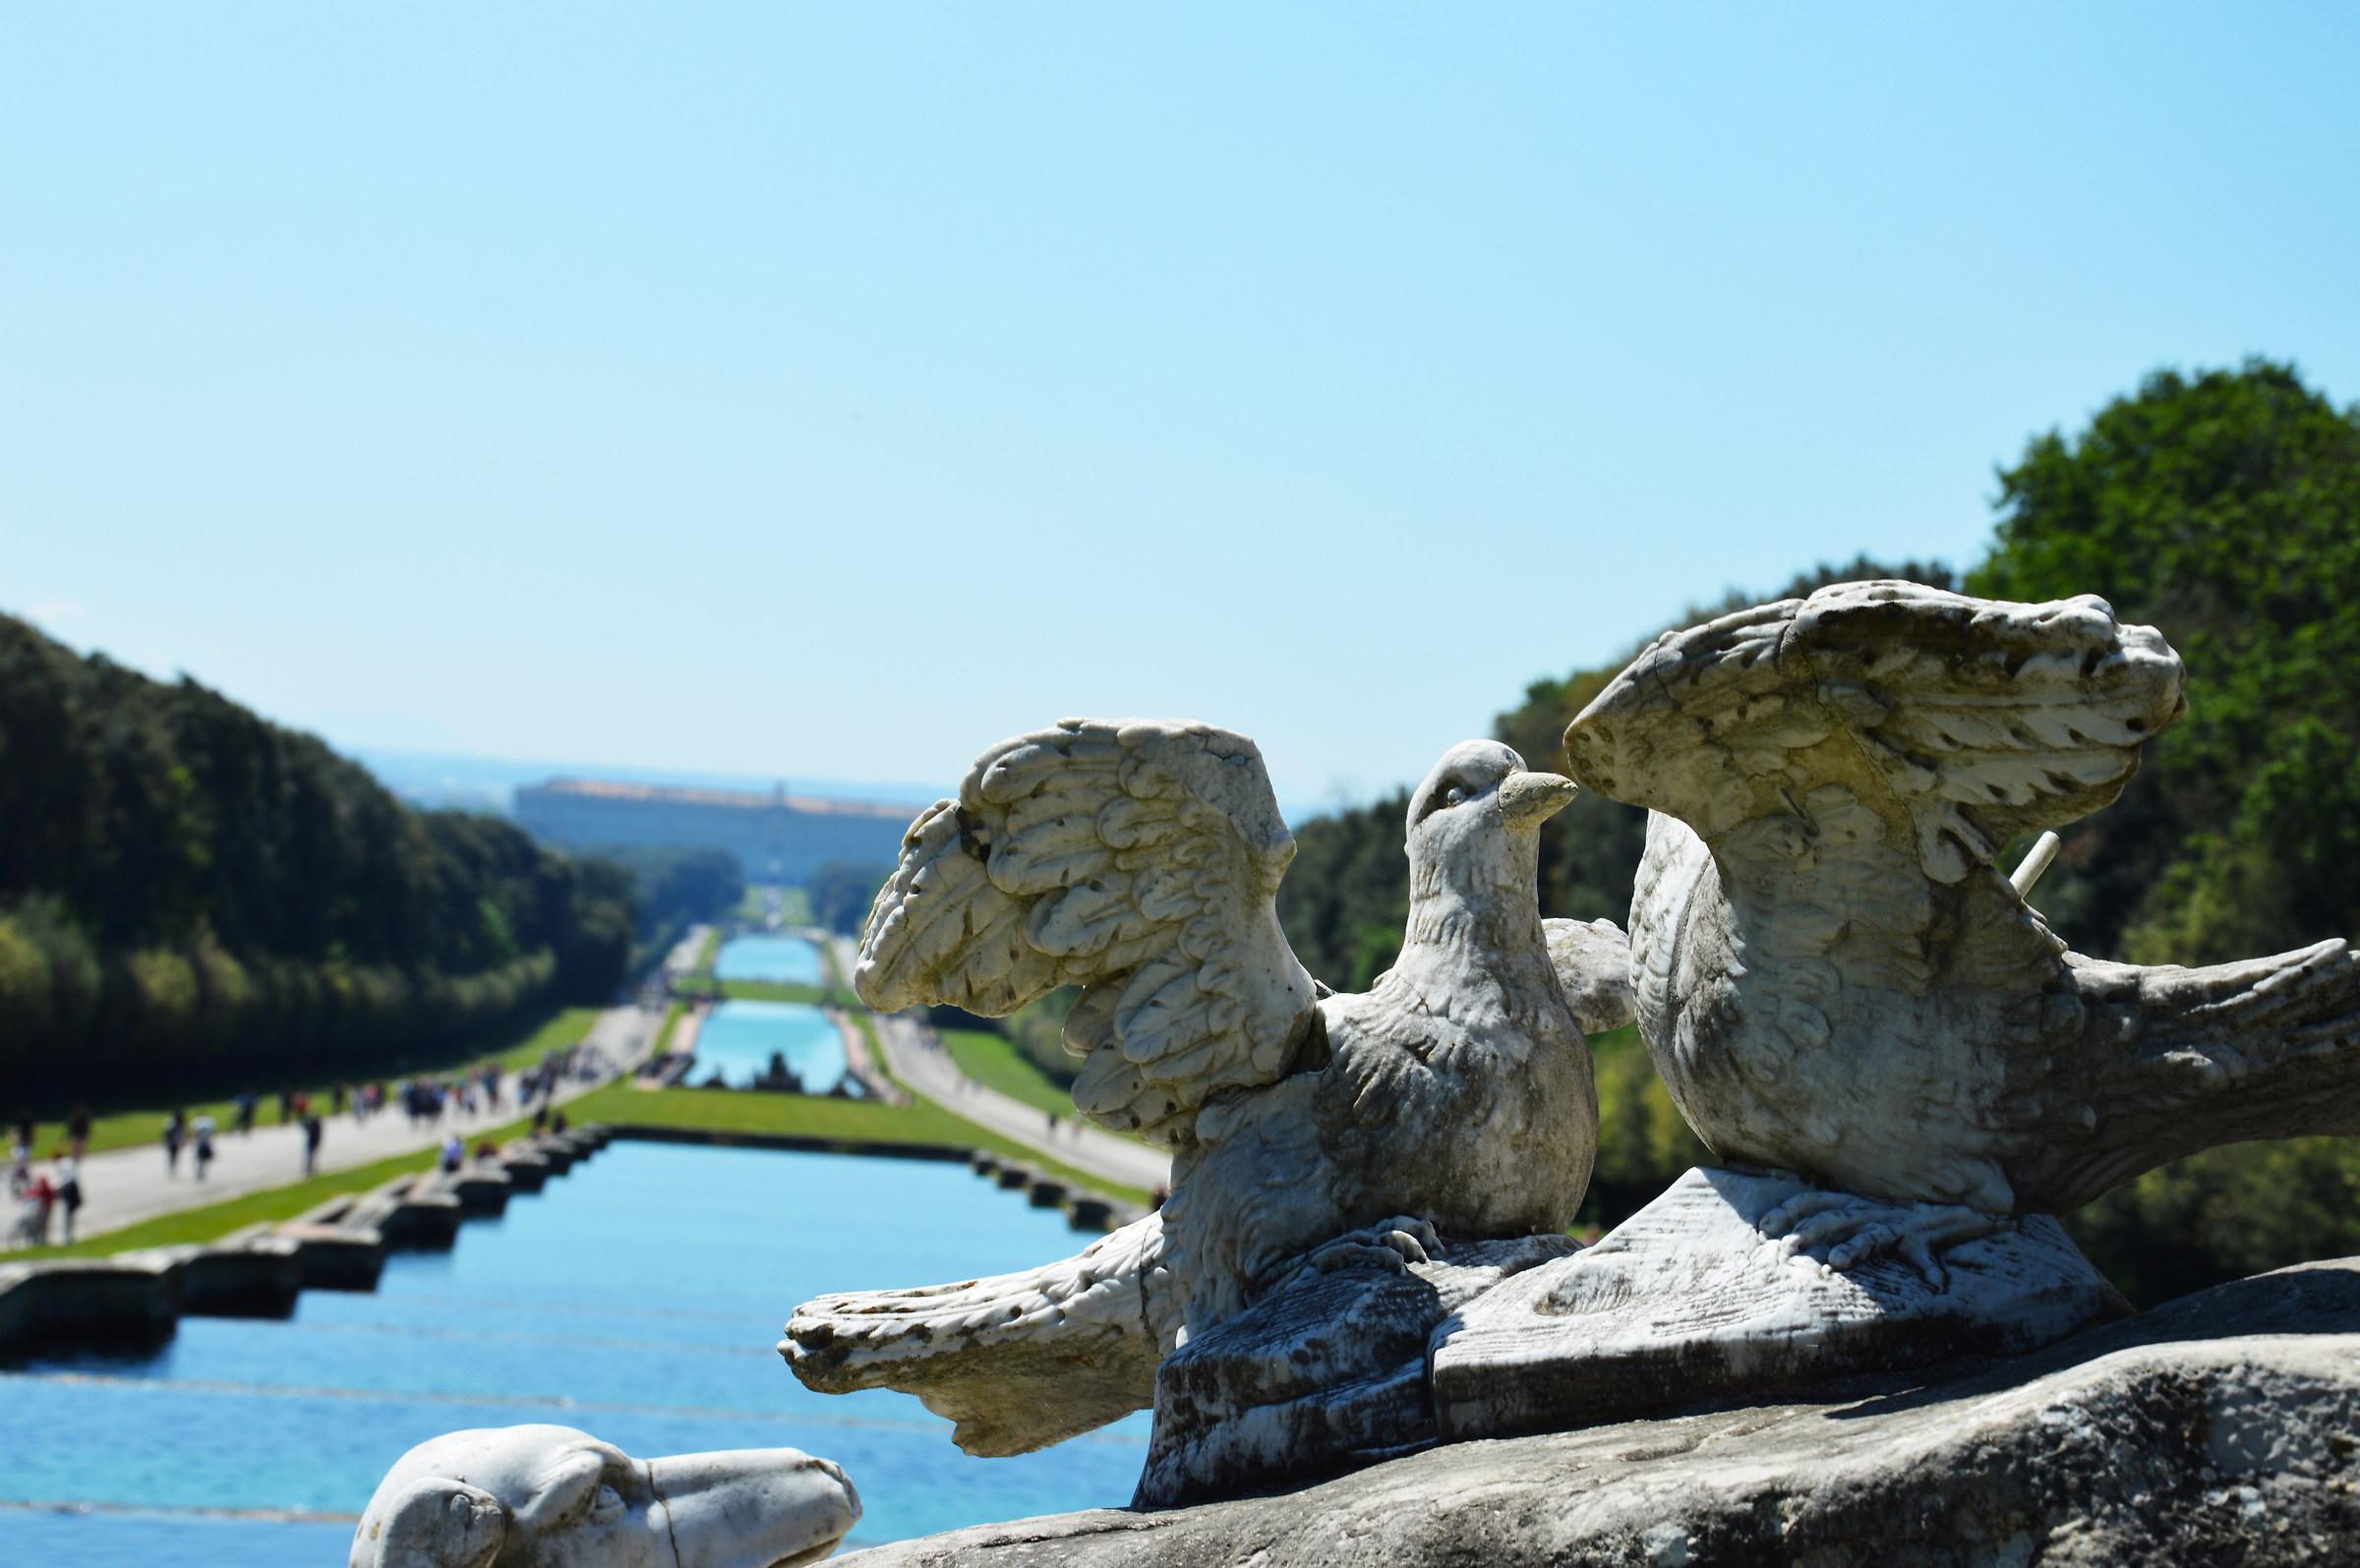 Palace of Caserta...